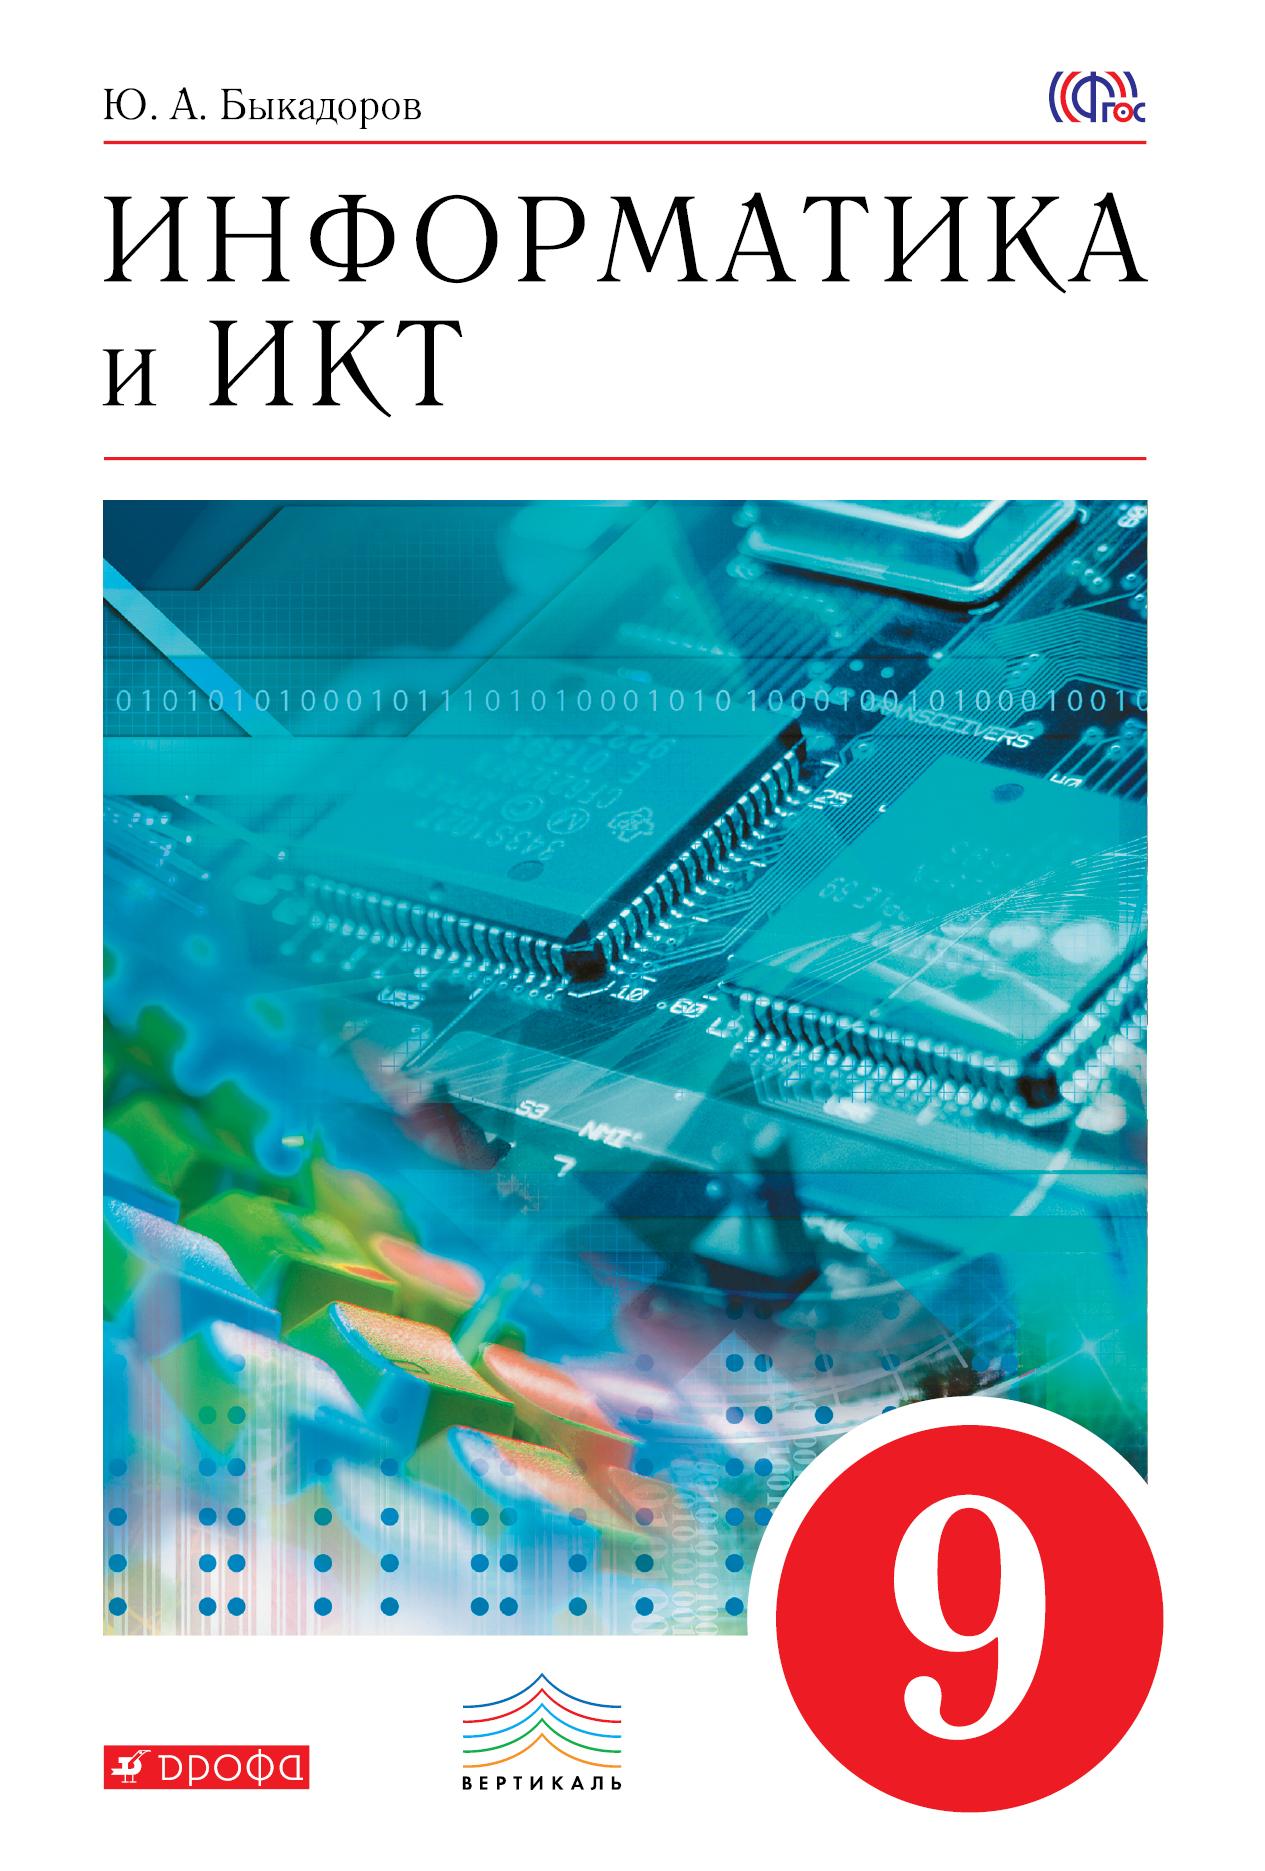 Юрий Александрович Быкадоров Информатика и ИКТ. 9 класс. Учебник. информатика и икт 11 класс учебник базовый уровень